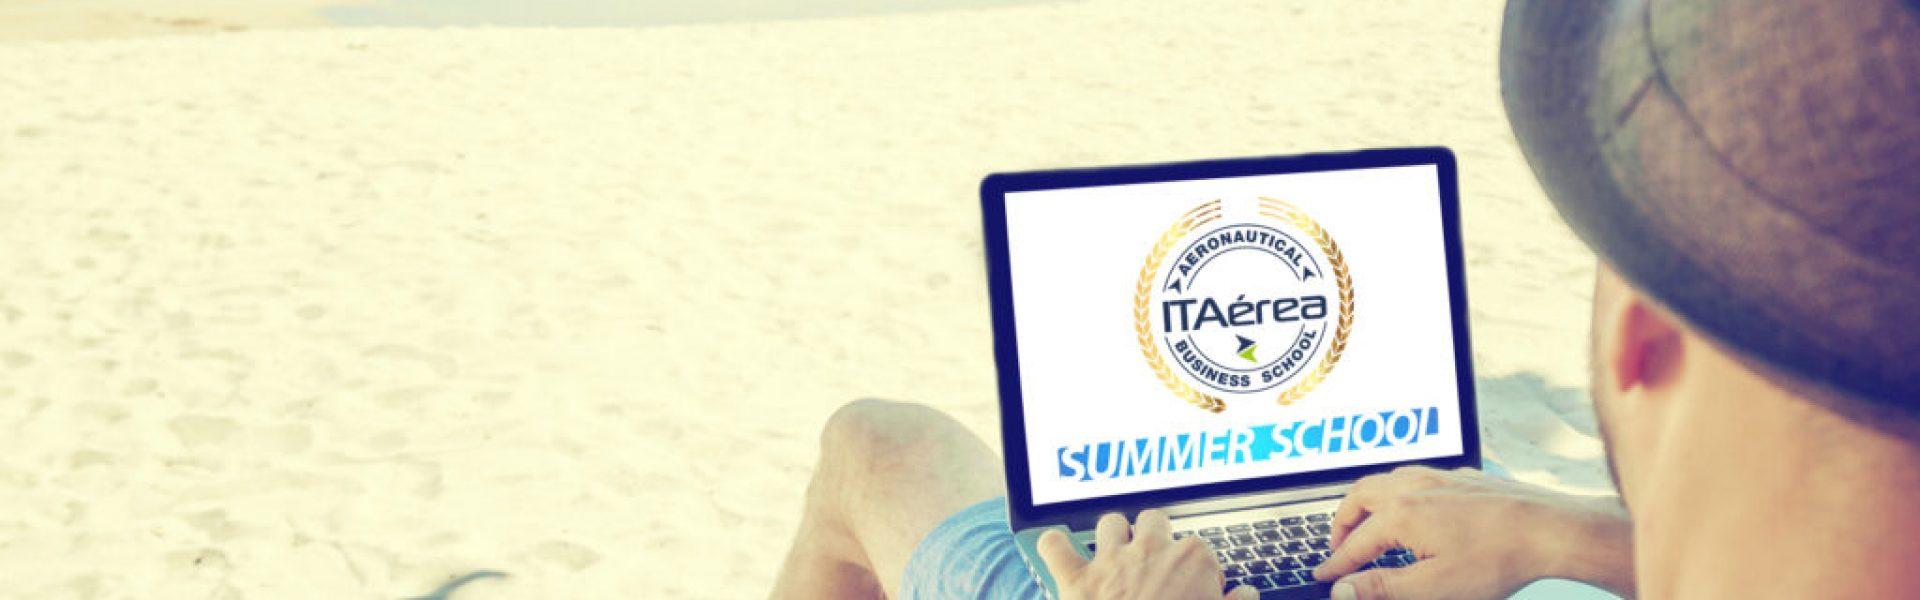 SUMMER-SCHOOL-2-1024x671